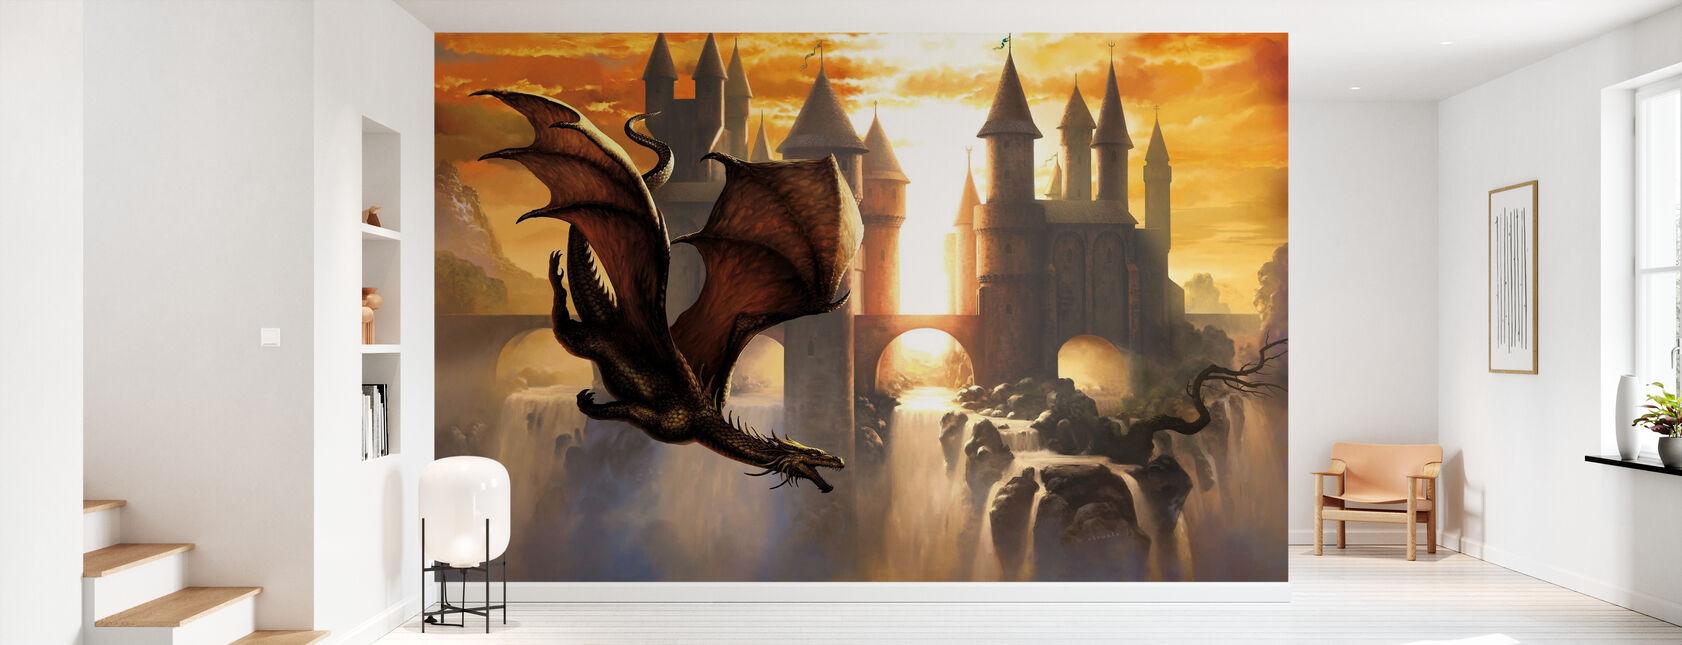 Sunset Dragon - Wallpaper - Hallway